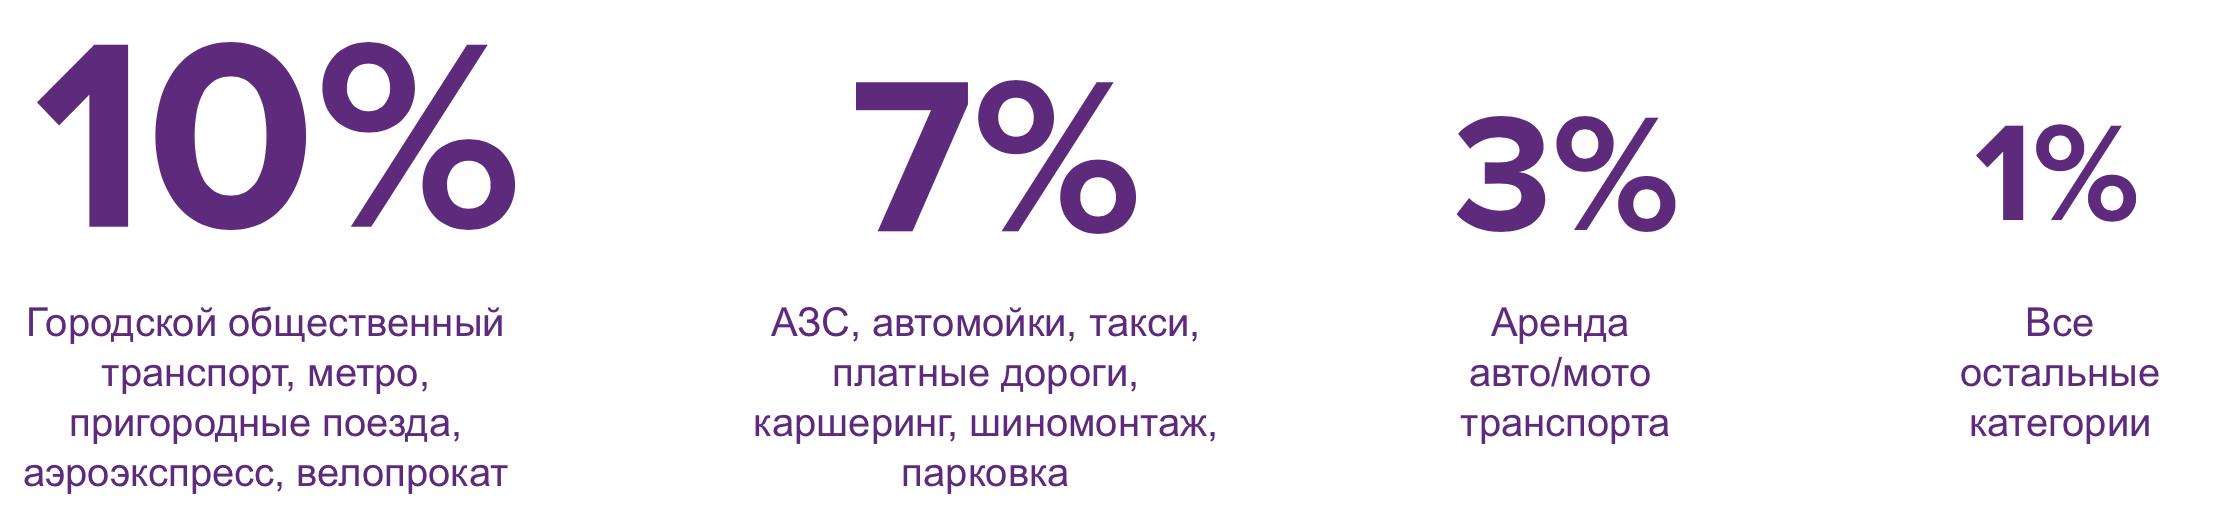 Кэшбэк Урбан